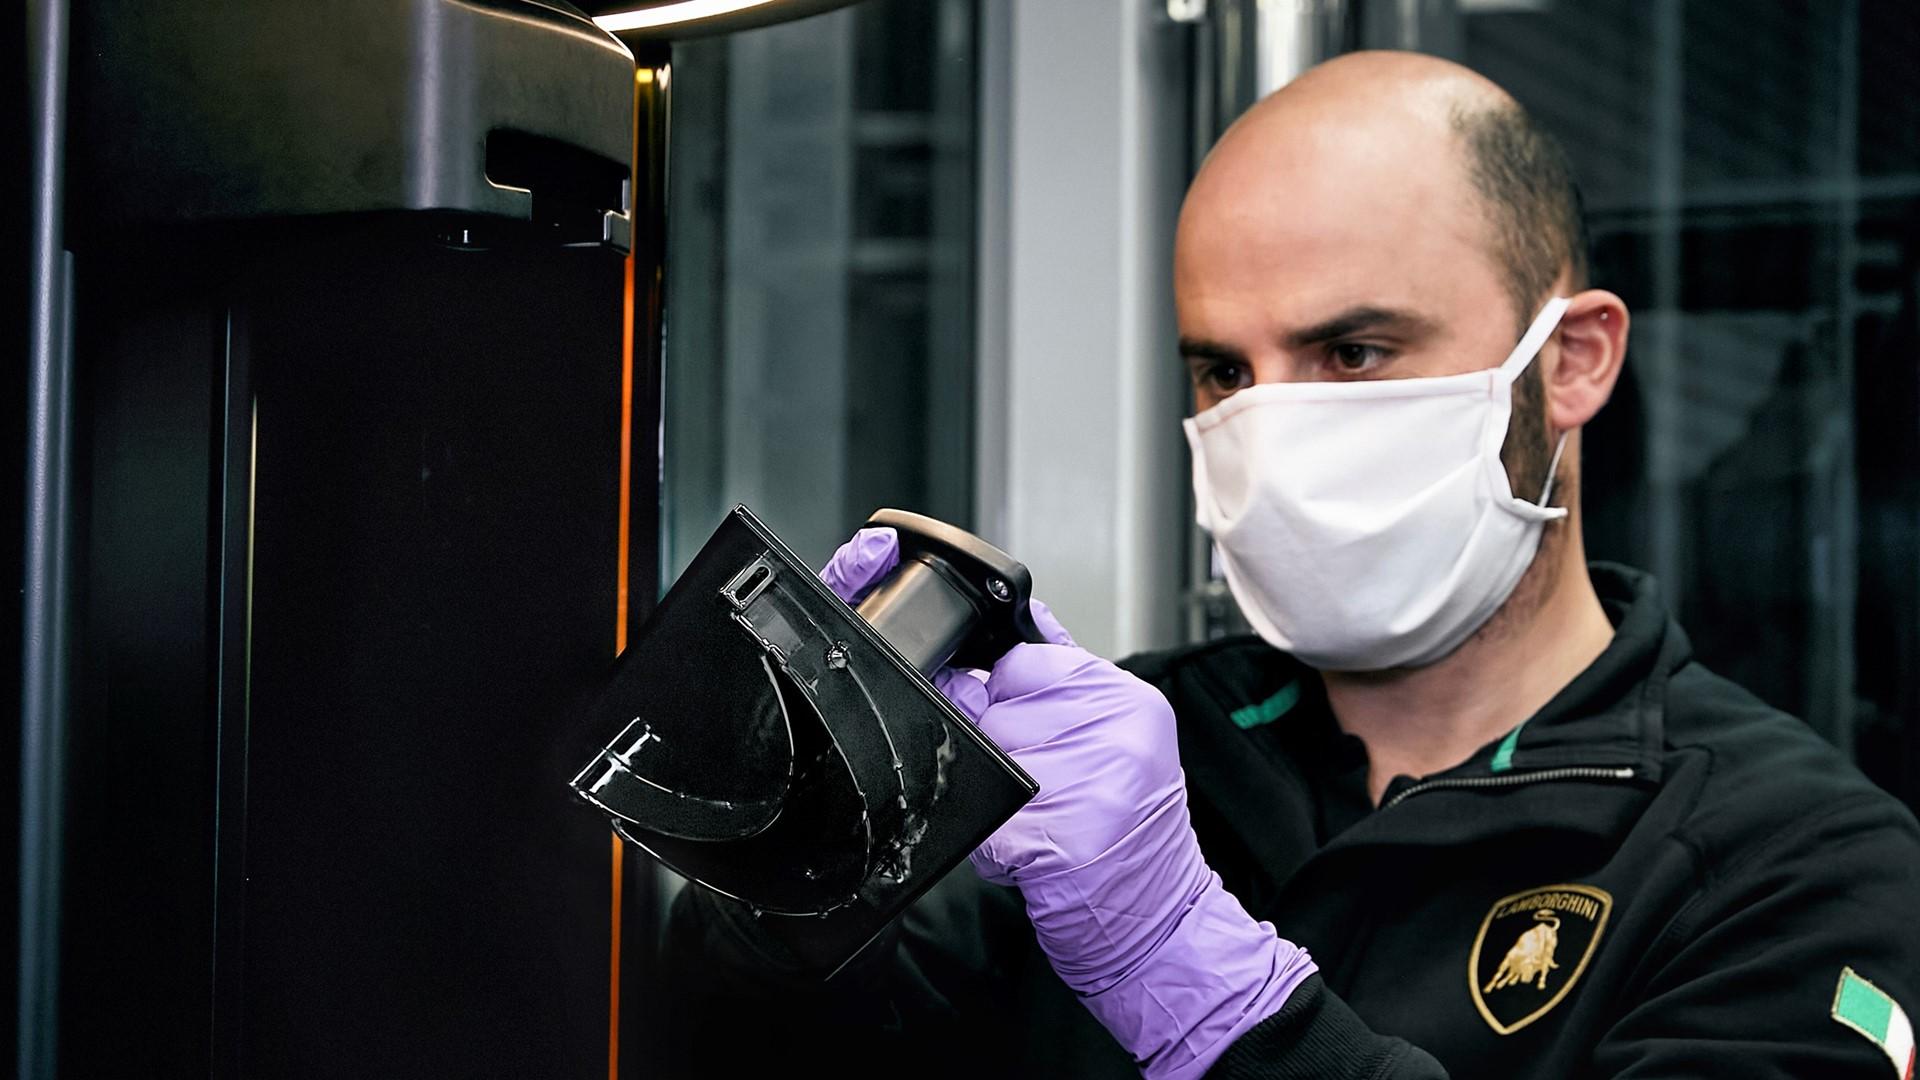 Automobili Lamborghini starts production of surgical masks and medical shields for use in Coronavirus pandemic - Image 7